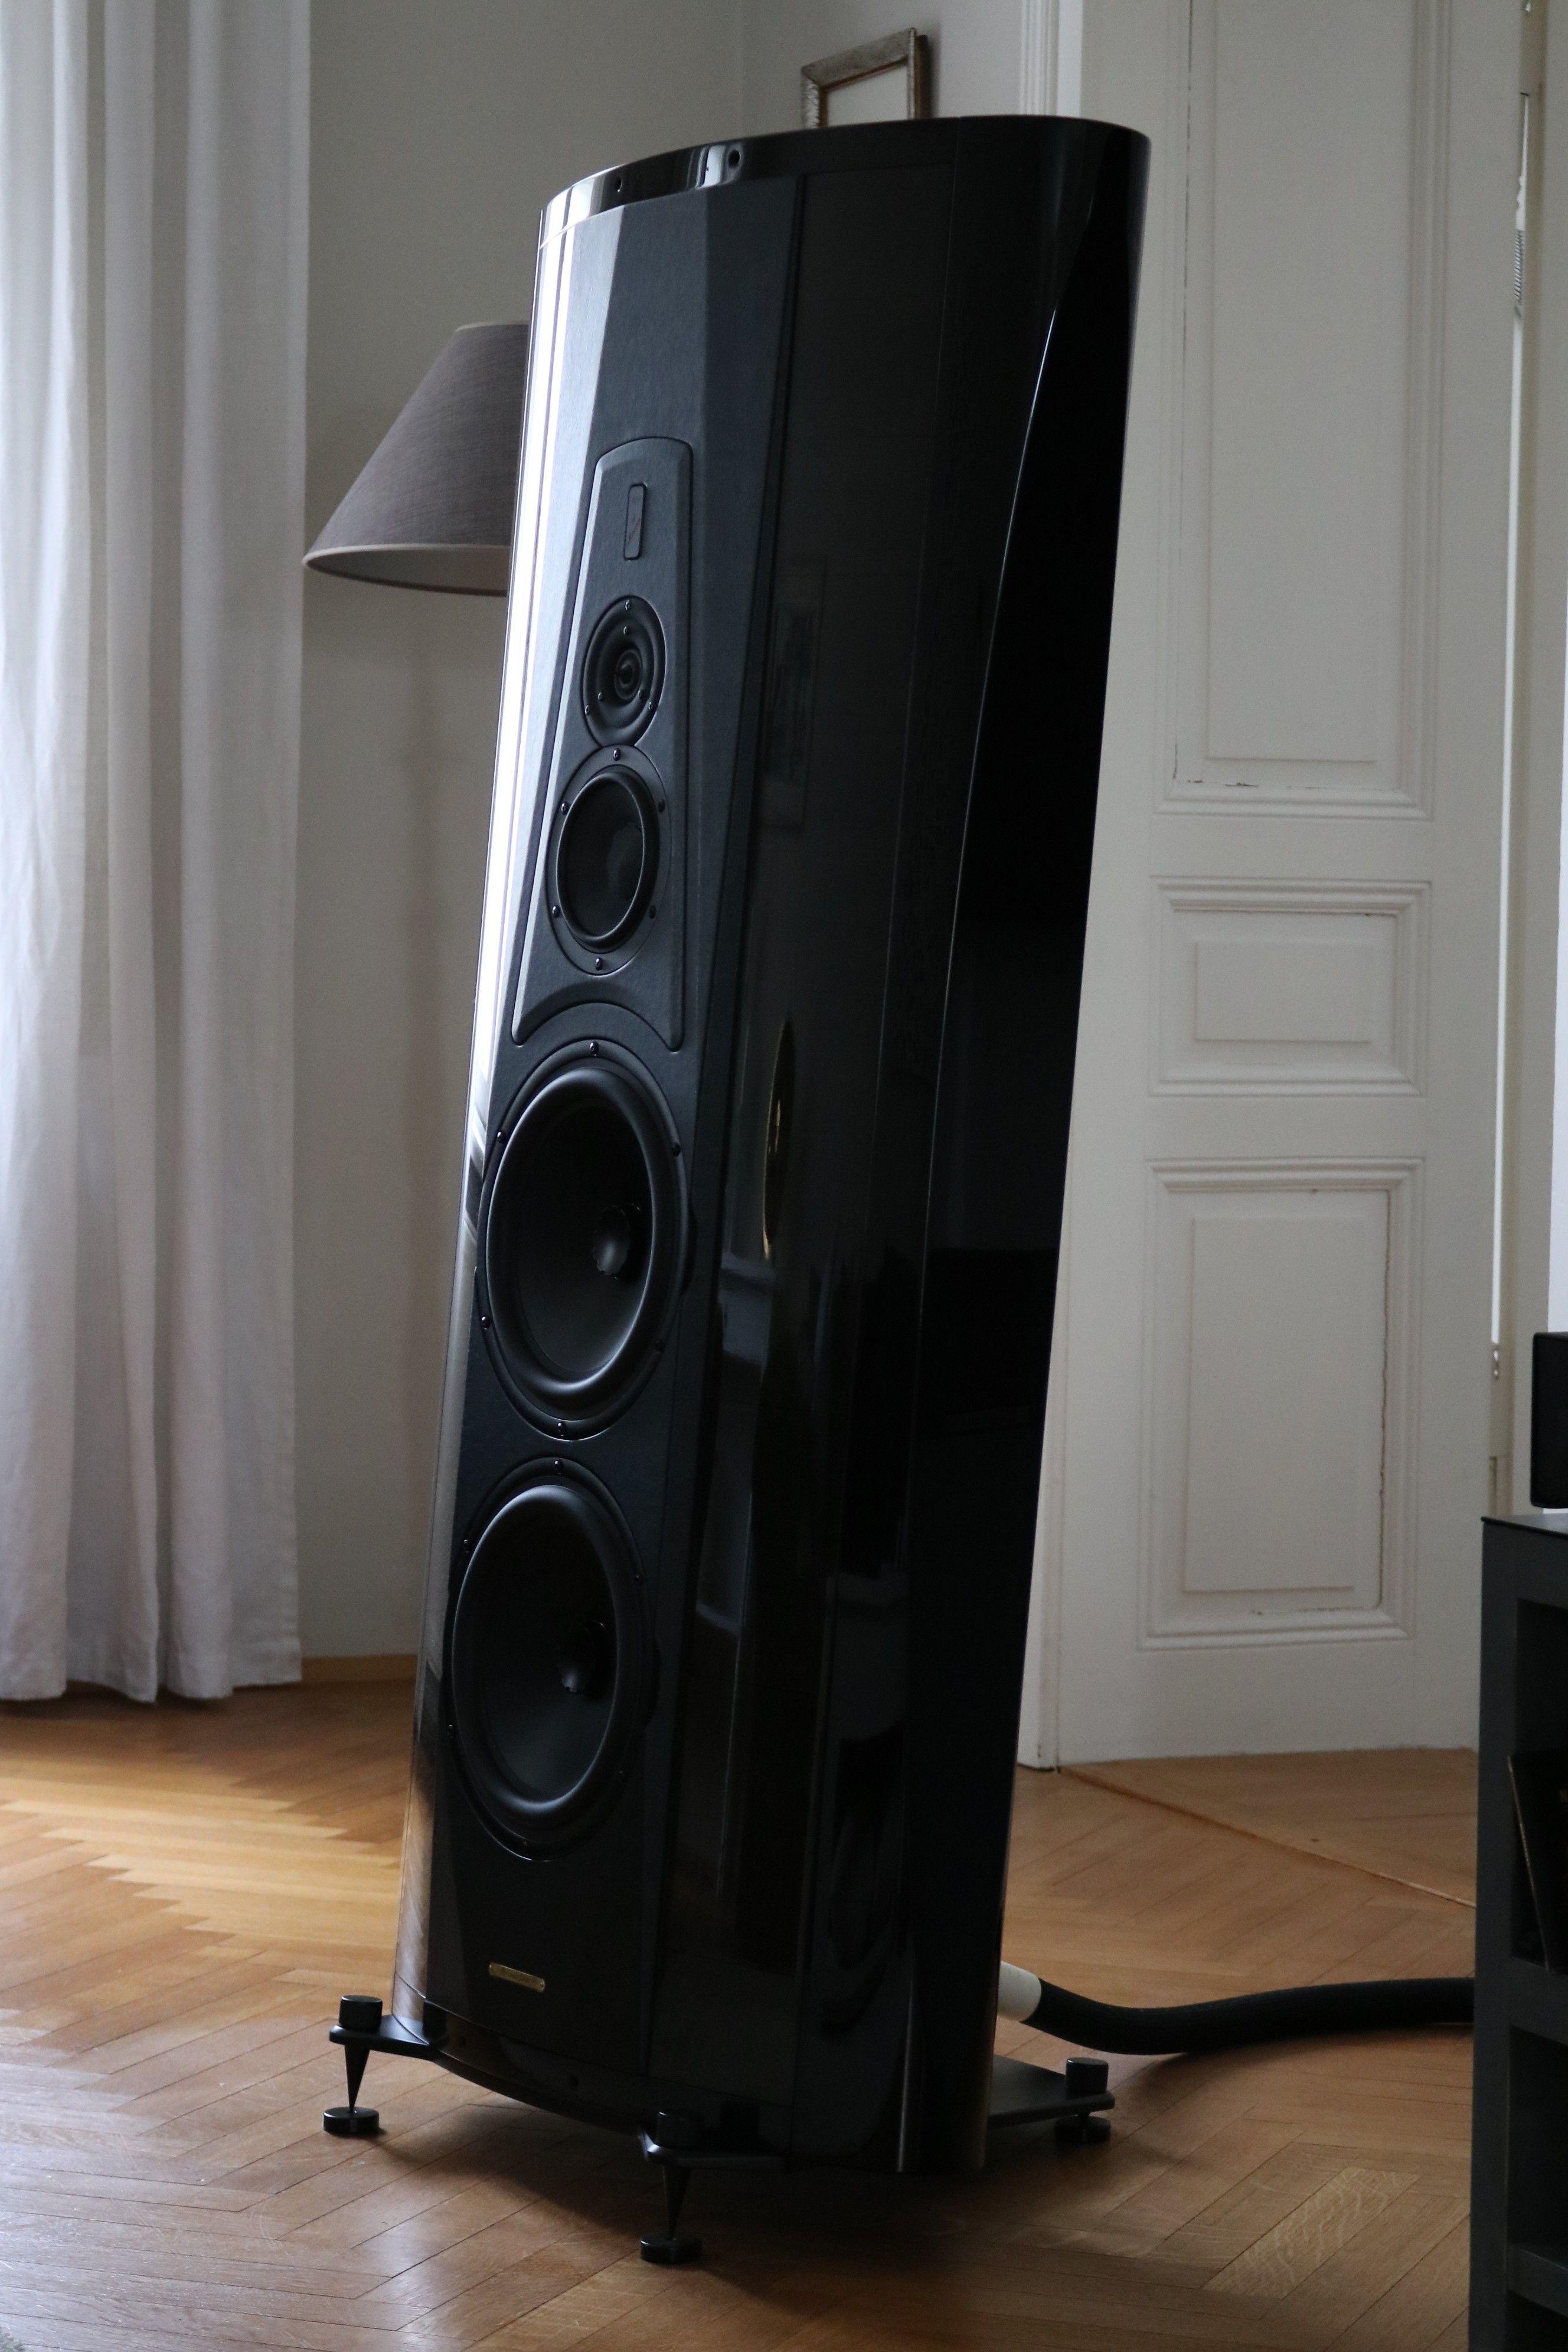 Sonus Faber Stradivari Homage Lautsprecher | High End Lautsprecher ...